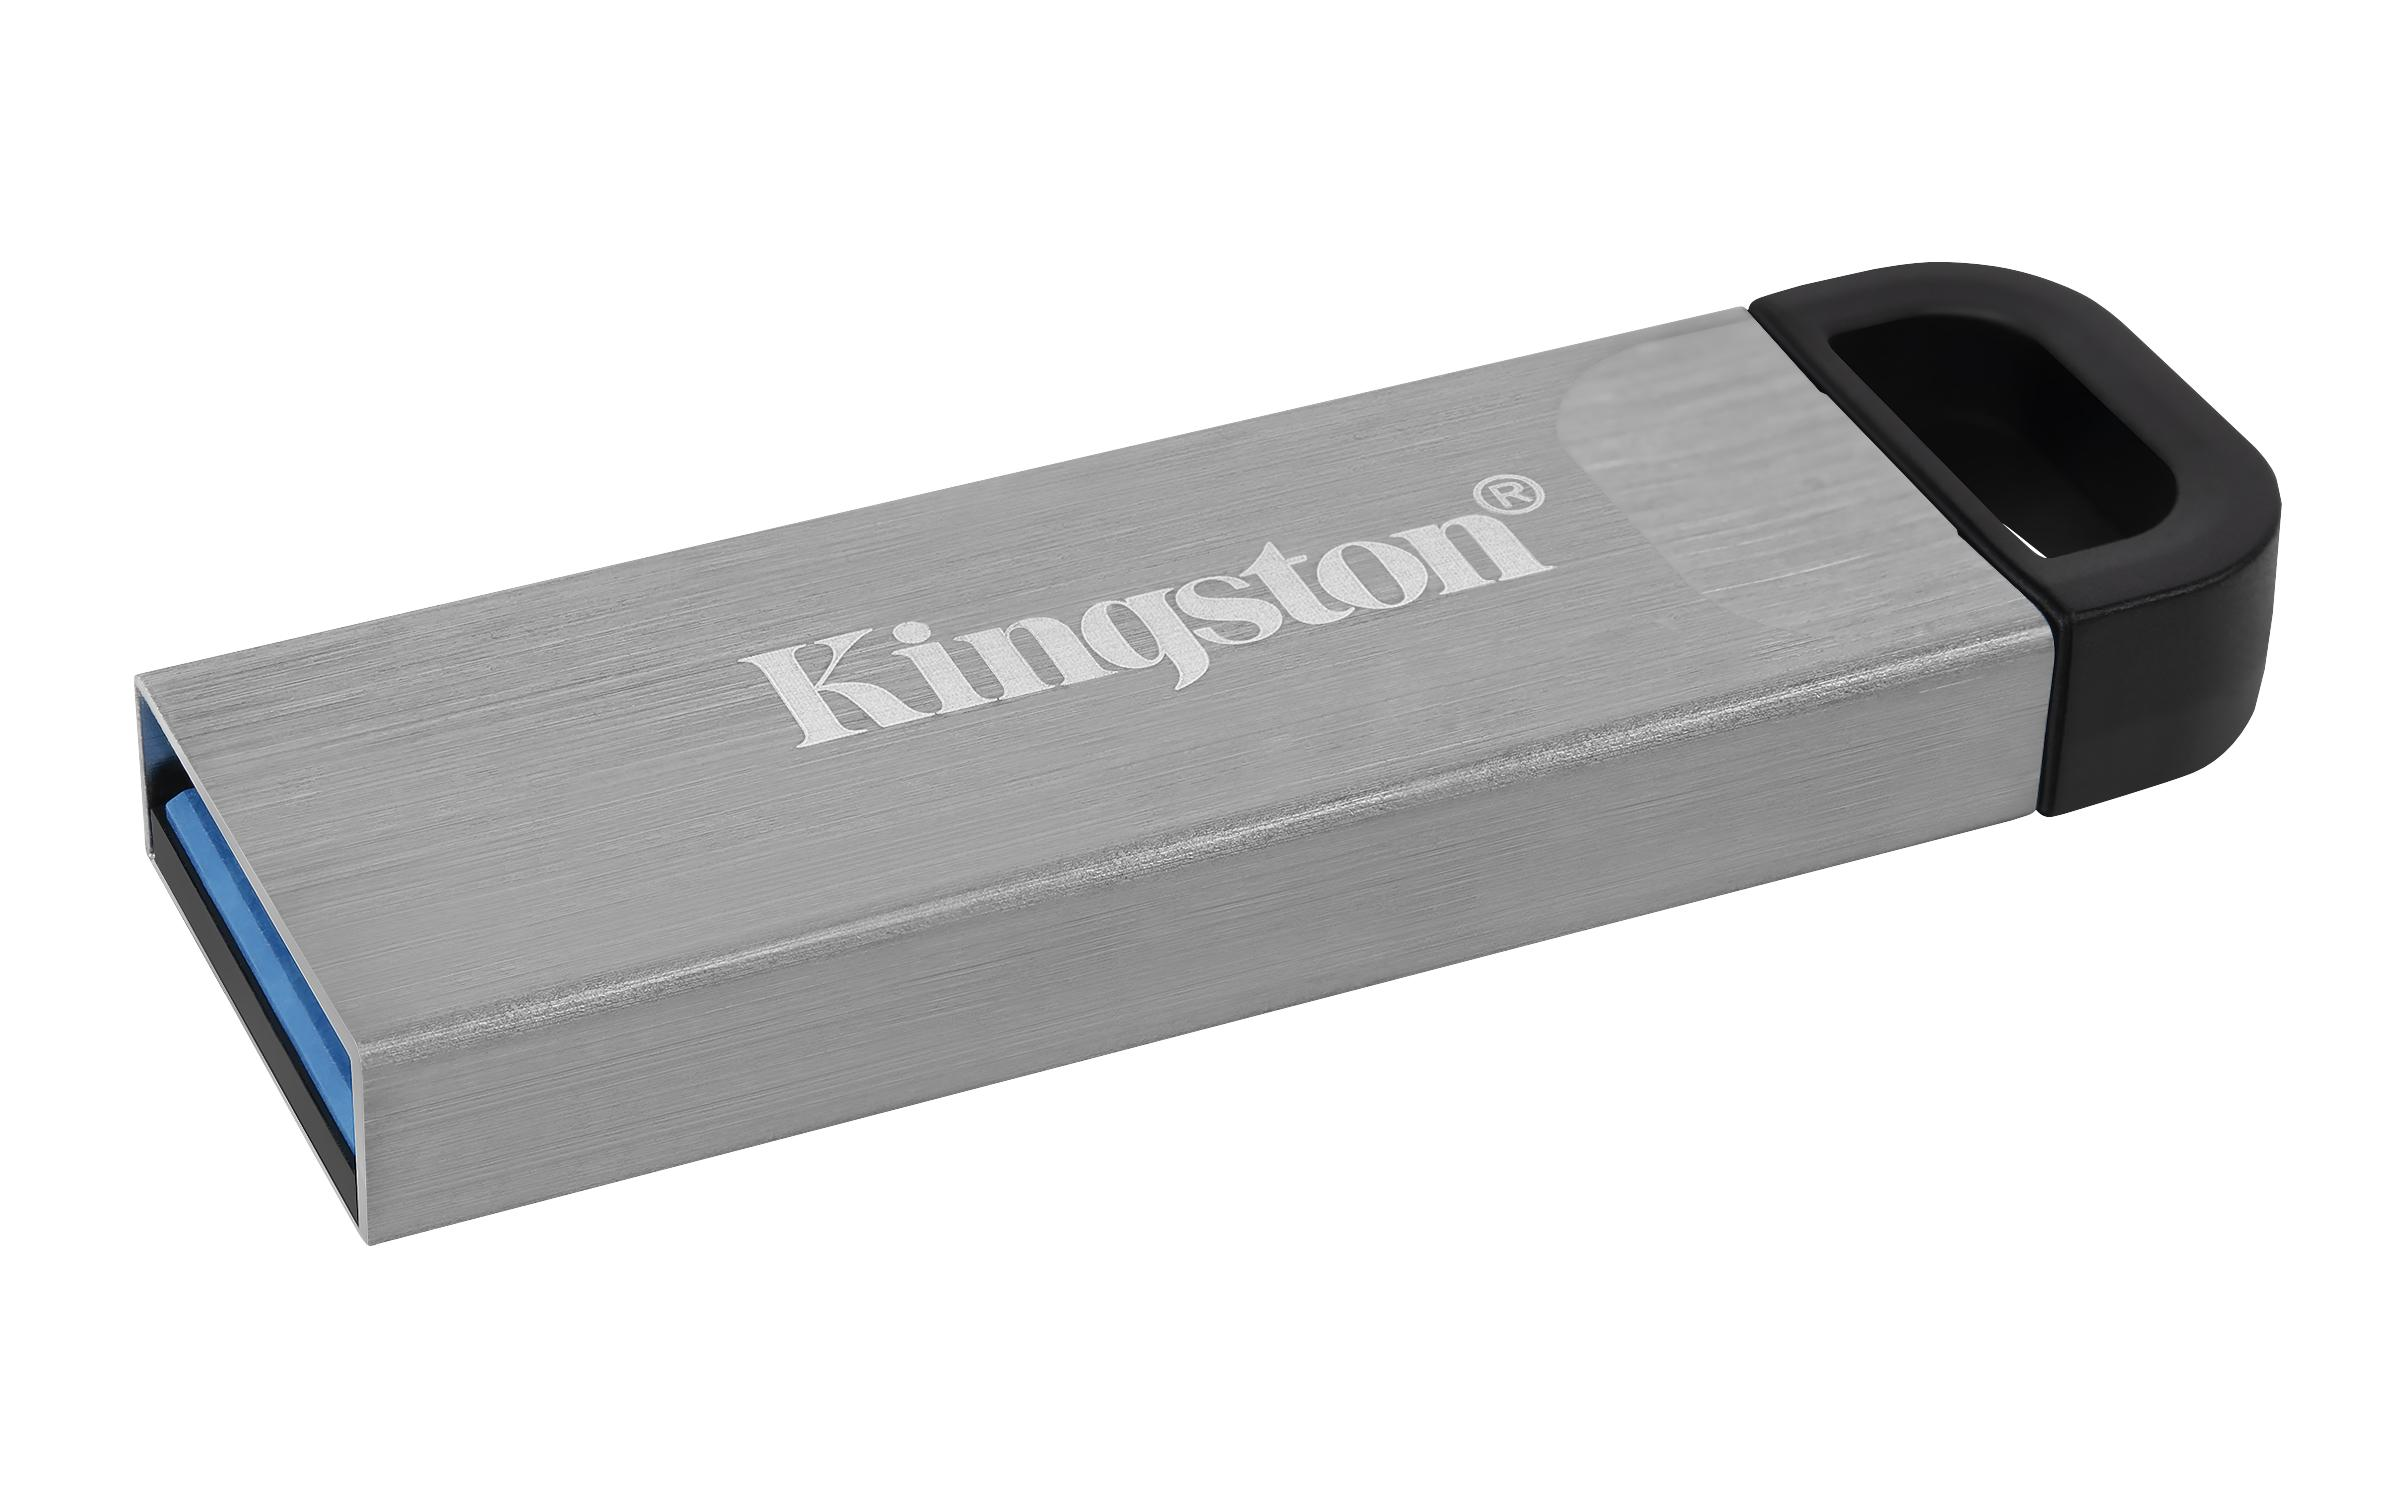 USB памет KINGSTON DataTraveler Kyson 32GB, USB 3.2 Gen 1, Сребрист-2